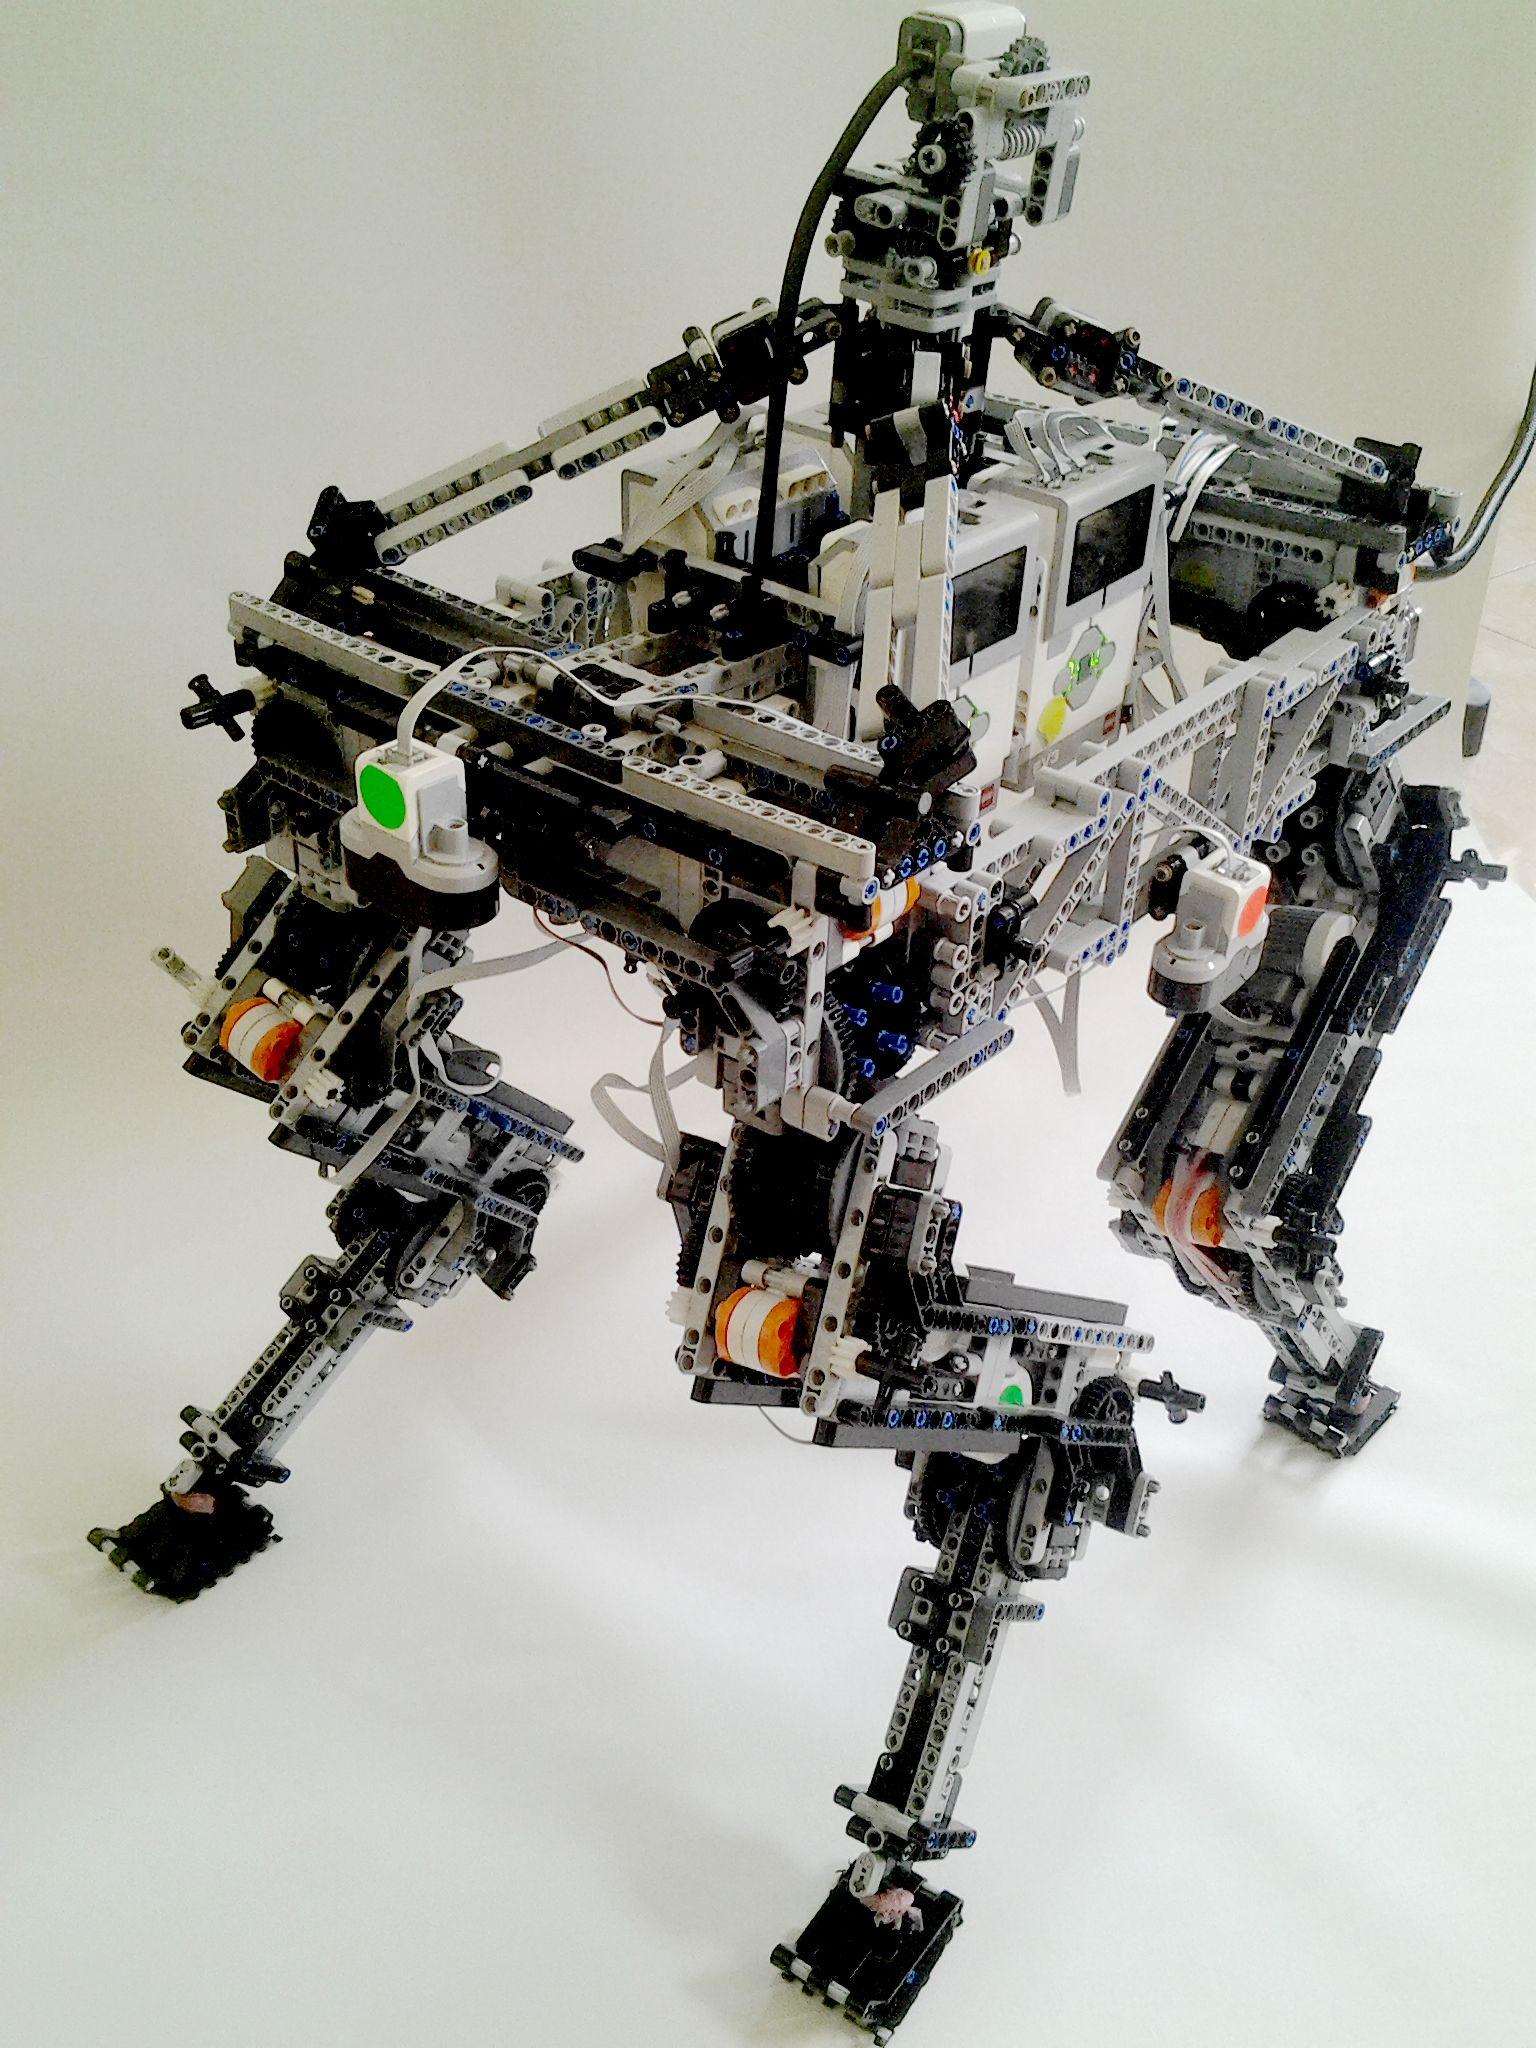 4 legs robot,all lego ,12 motors 4 ev3 mindstorm , 4 ir